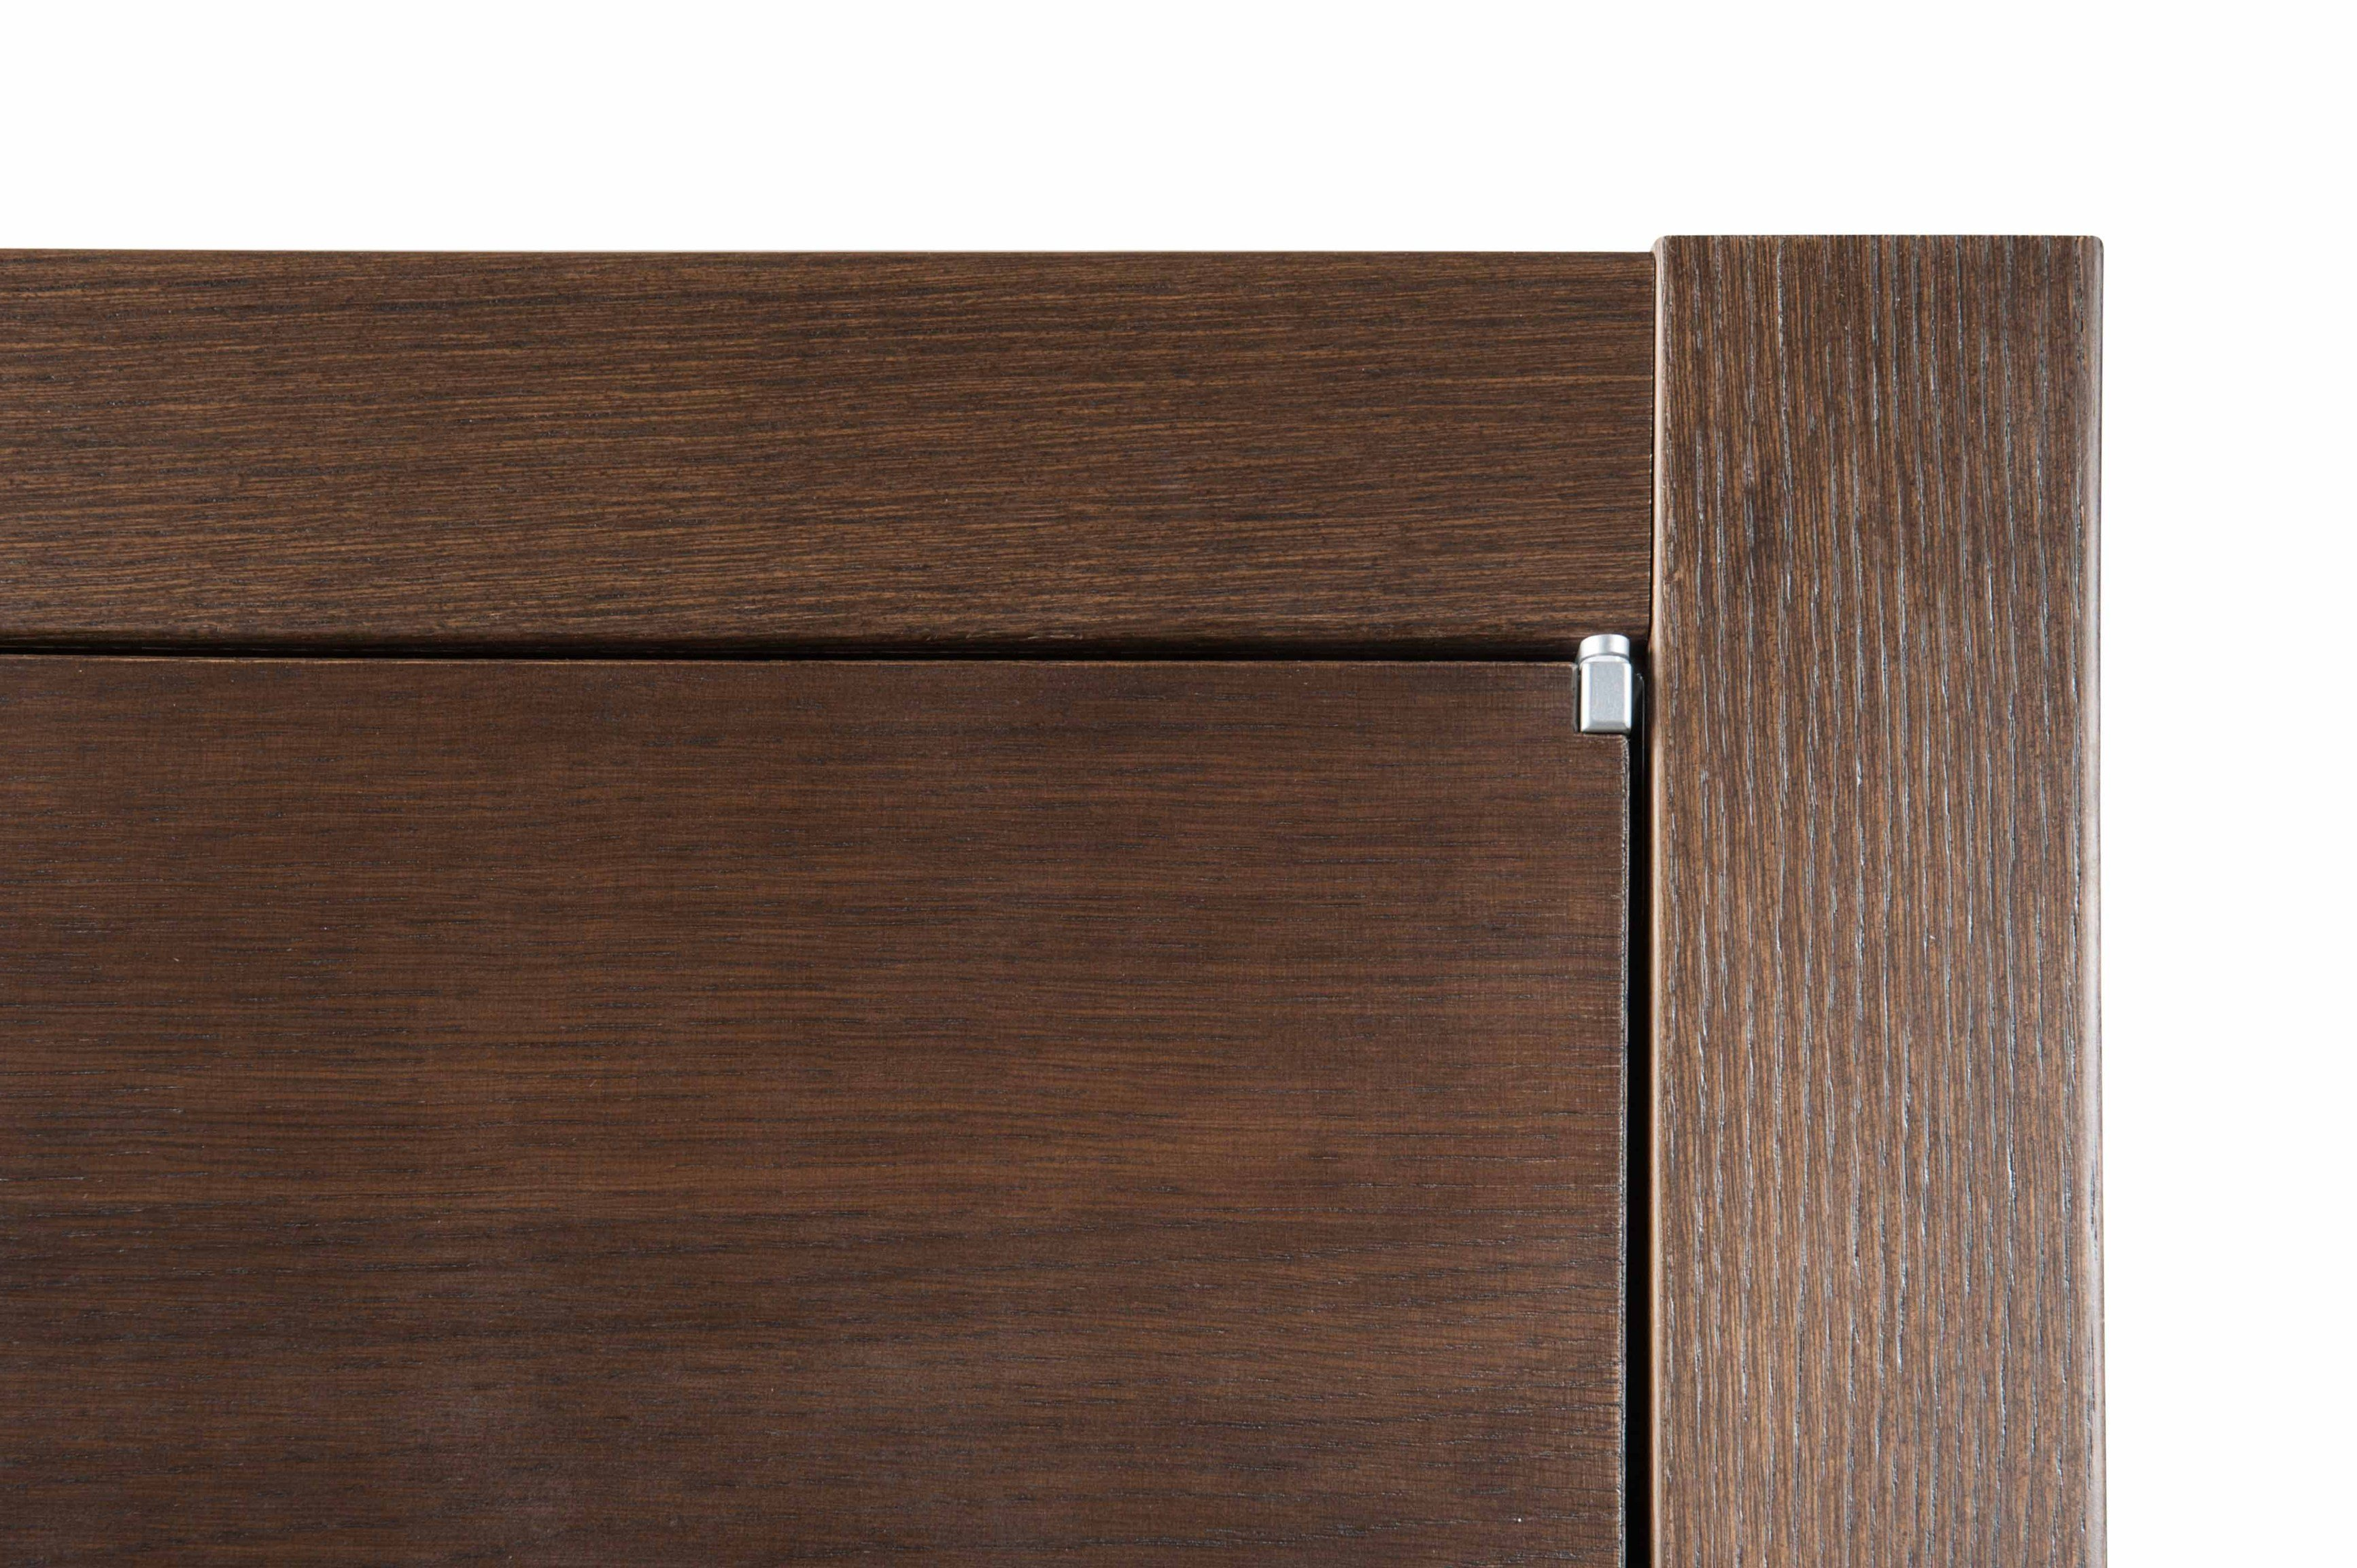 schiebet r system f r wandb ndige t ren evoluto by. Black Bedroom Furniture Sets. Home Design Ideas